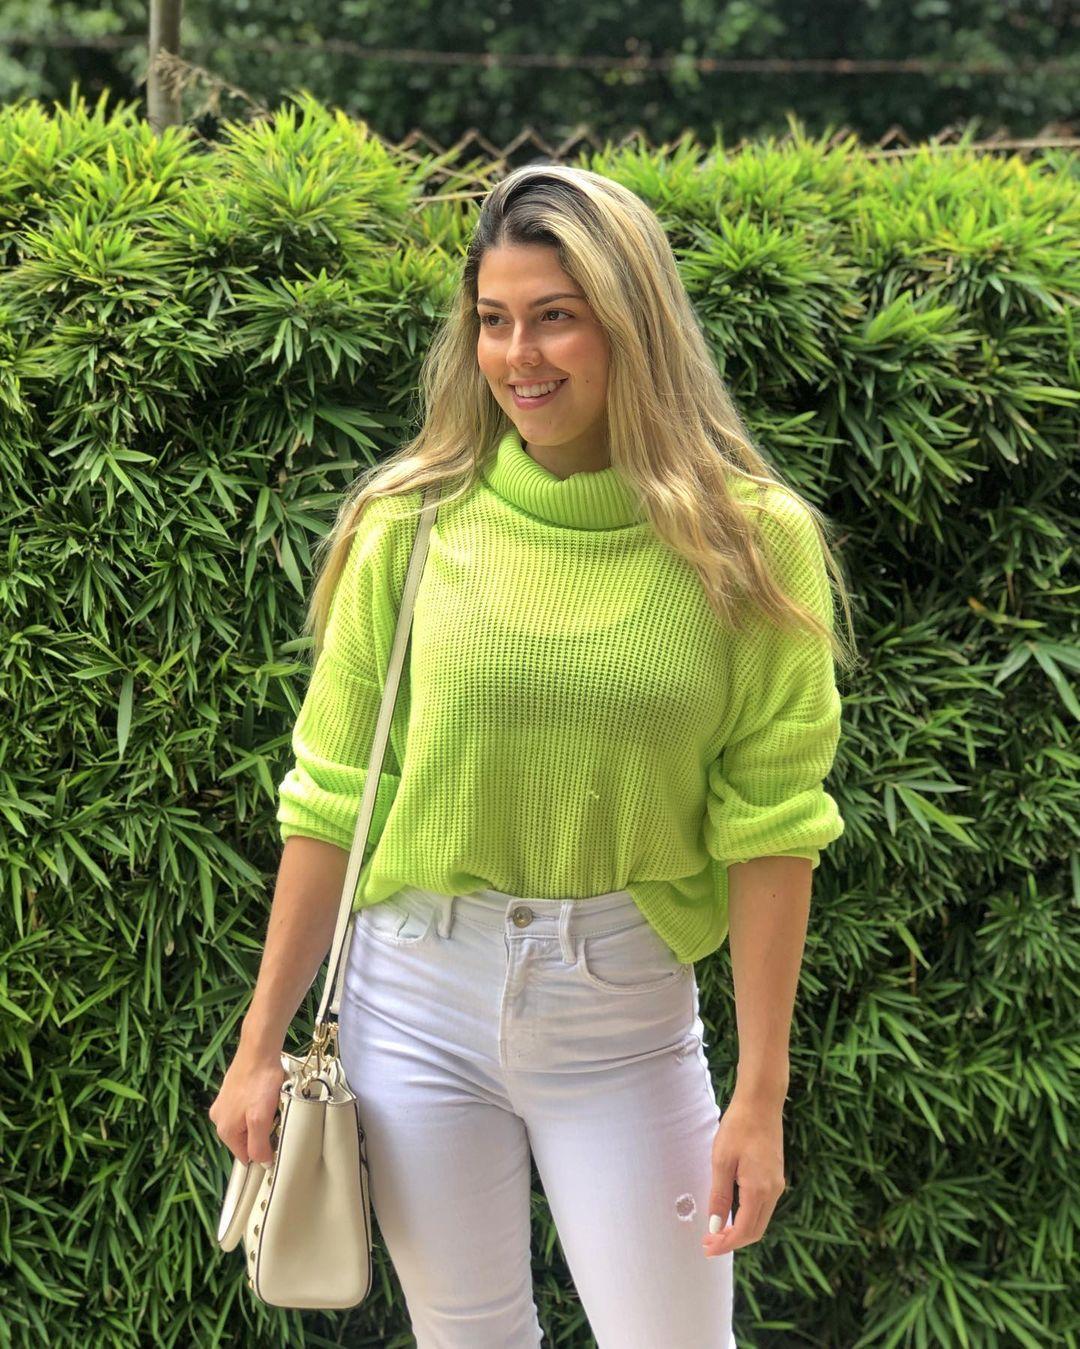 Mariana-Lopez-Wallpapers-Insta-Fit-Bio-1